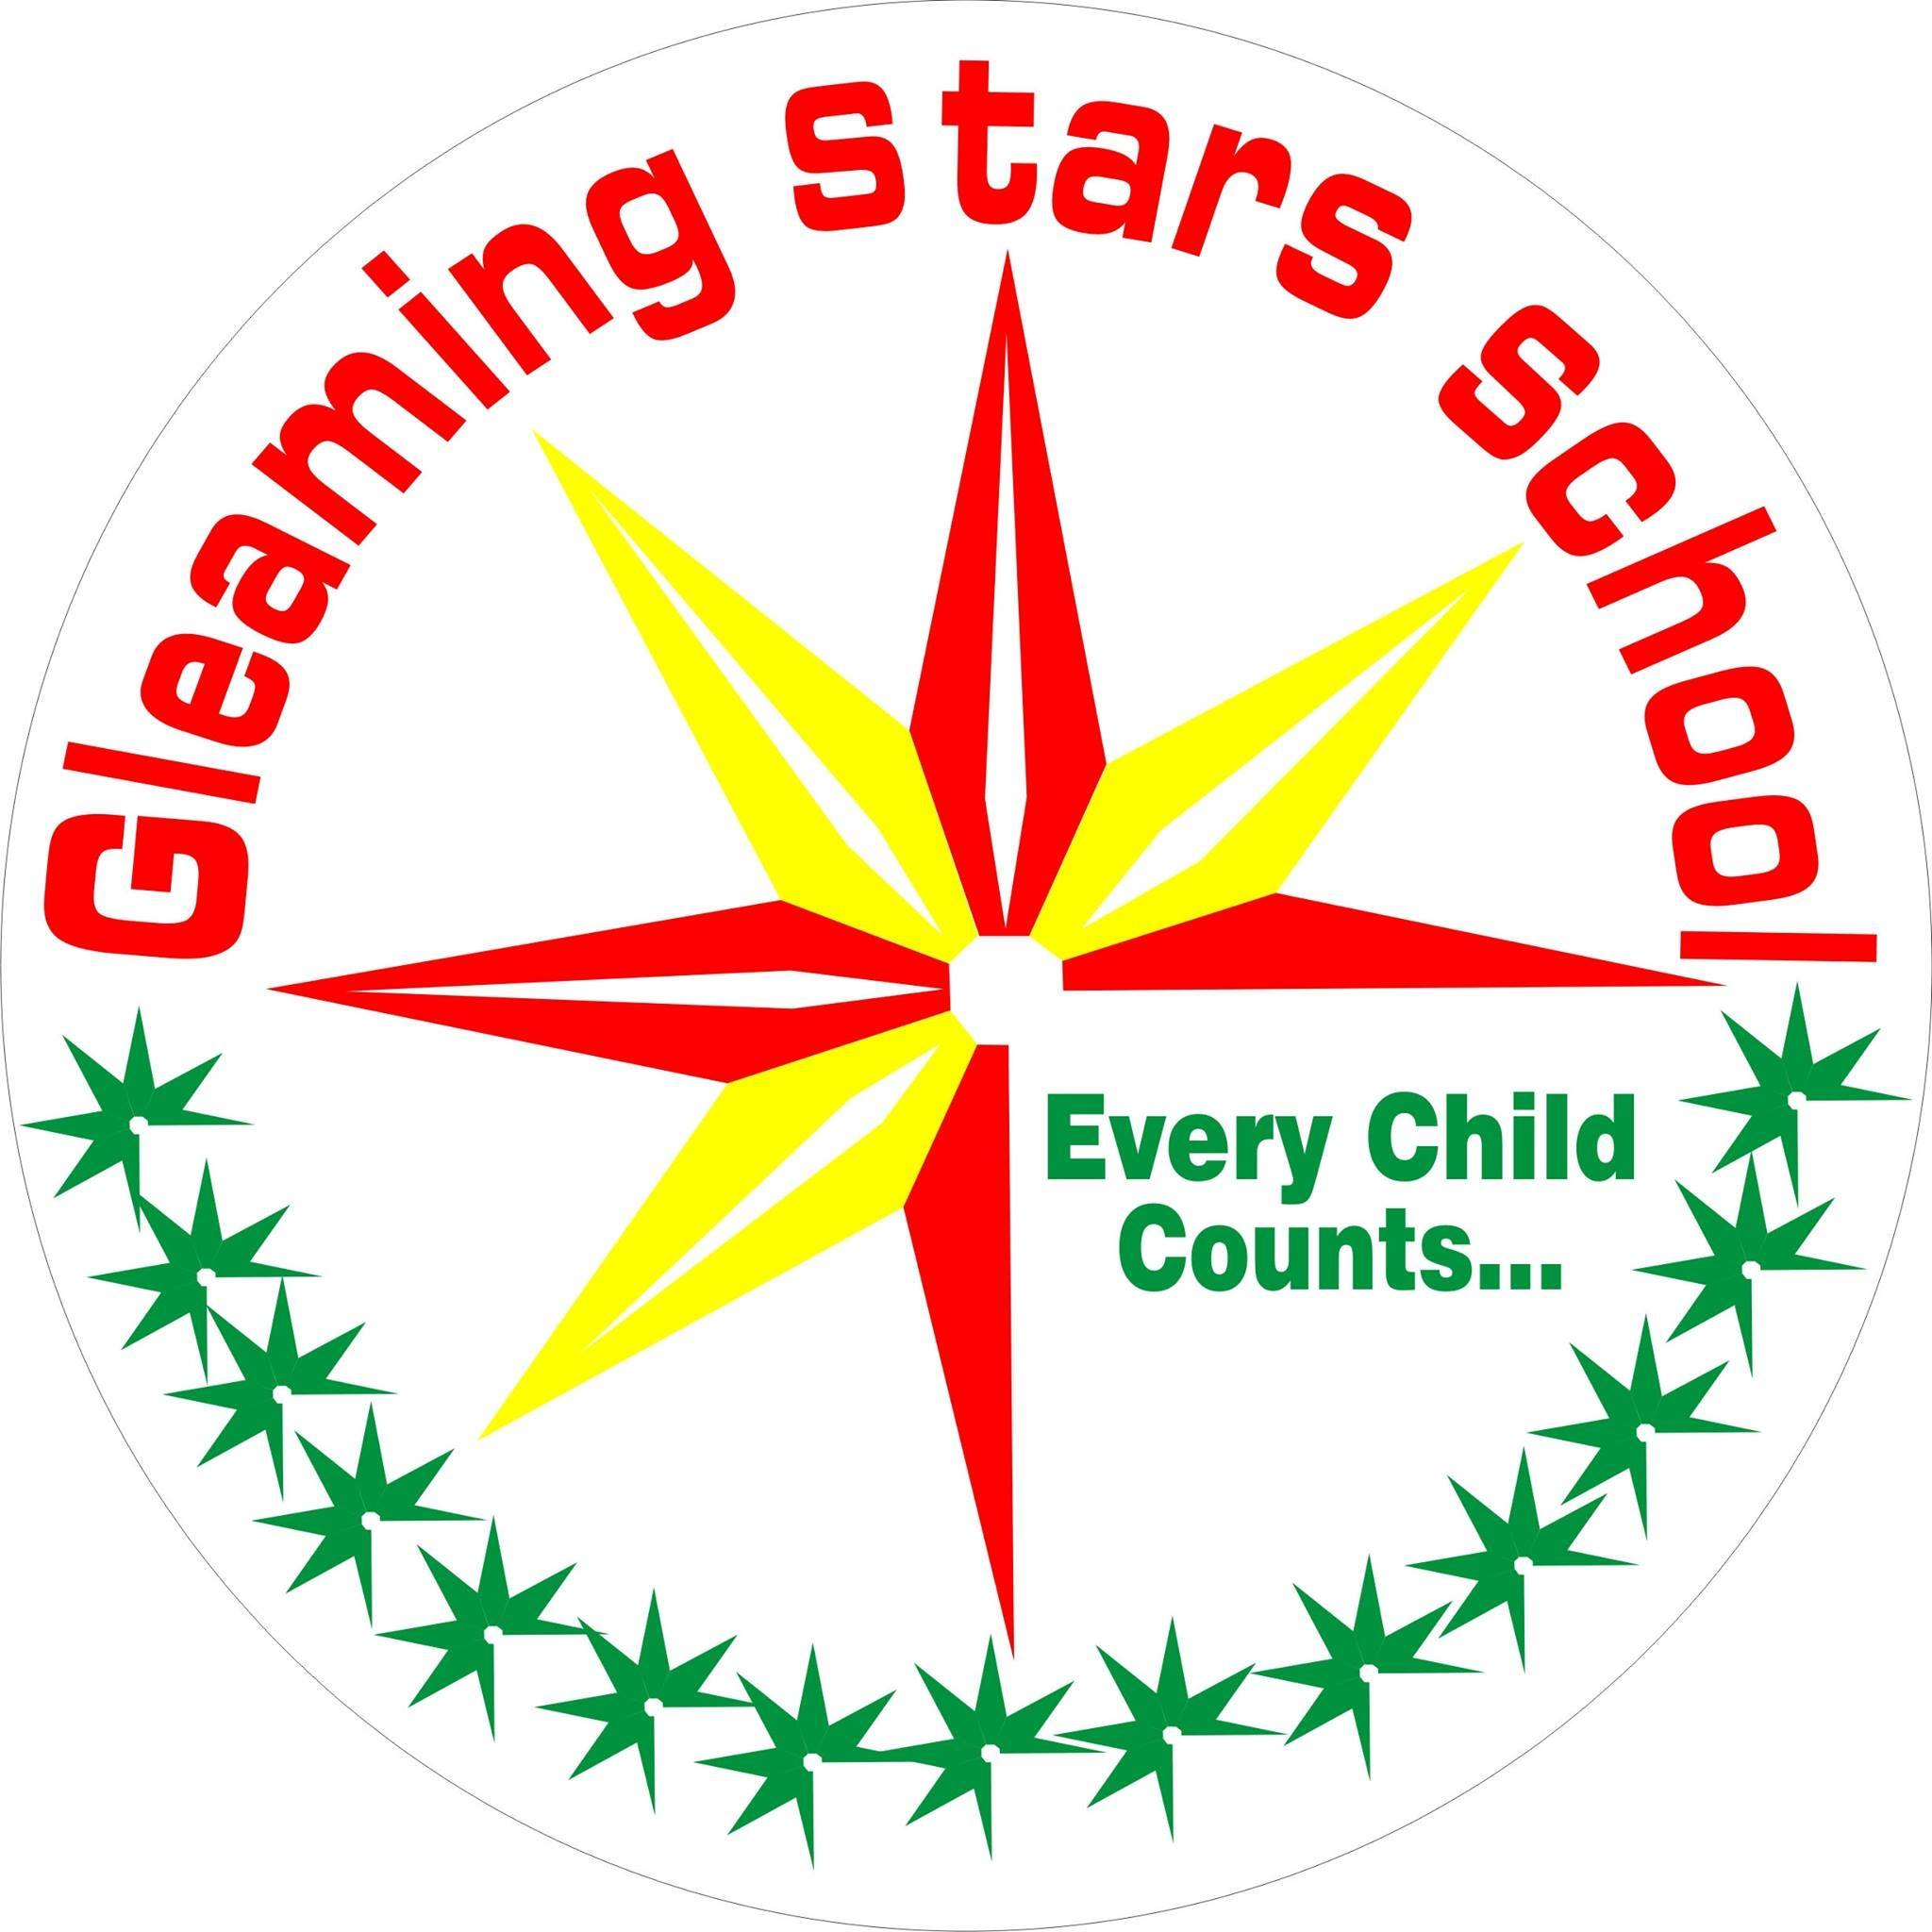 GLEAMING STARS SCHOOL, AKOWONJO